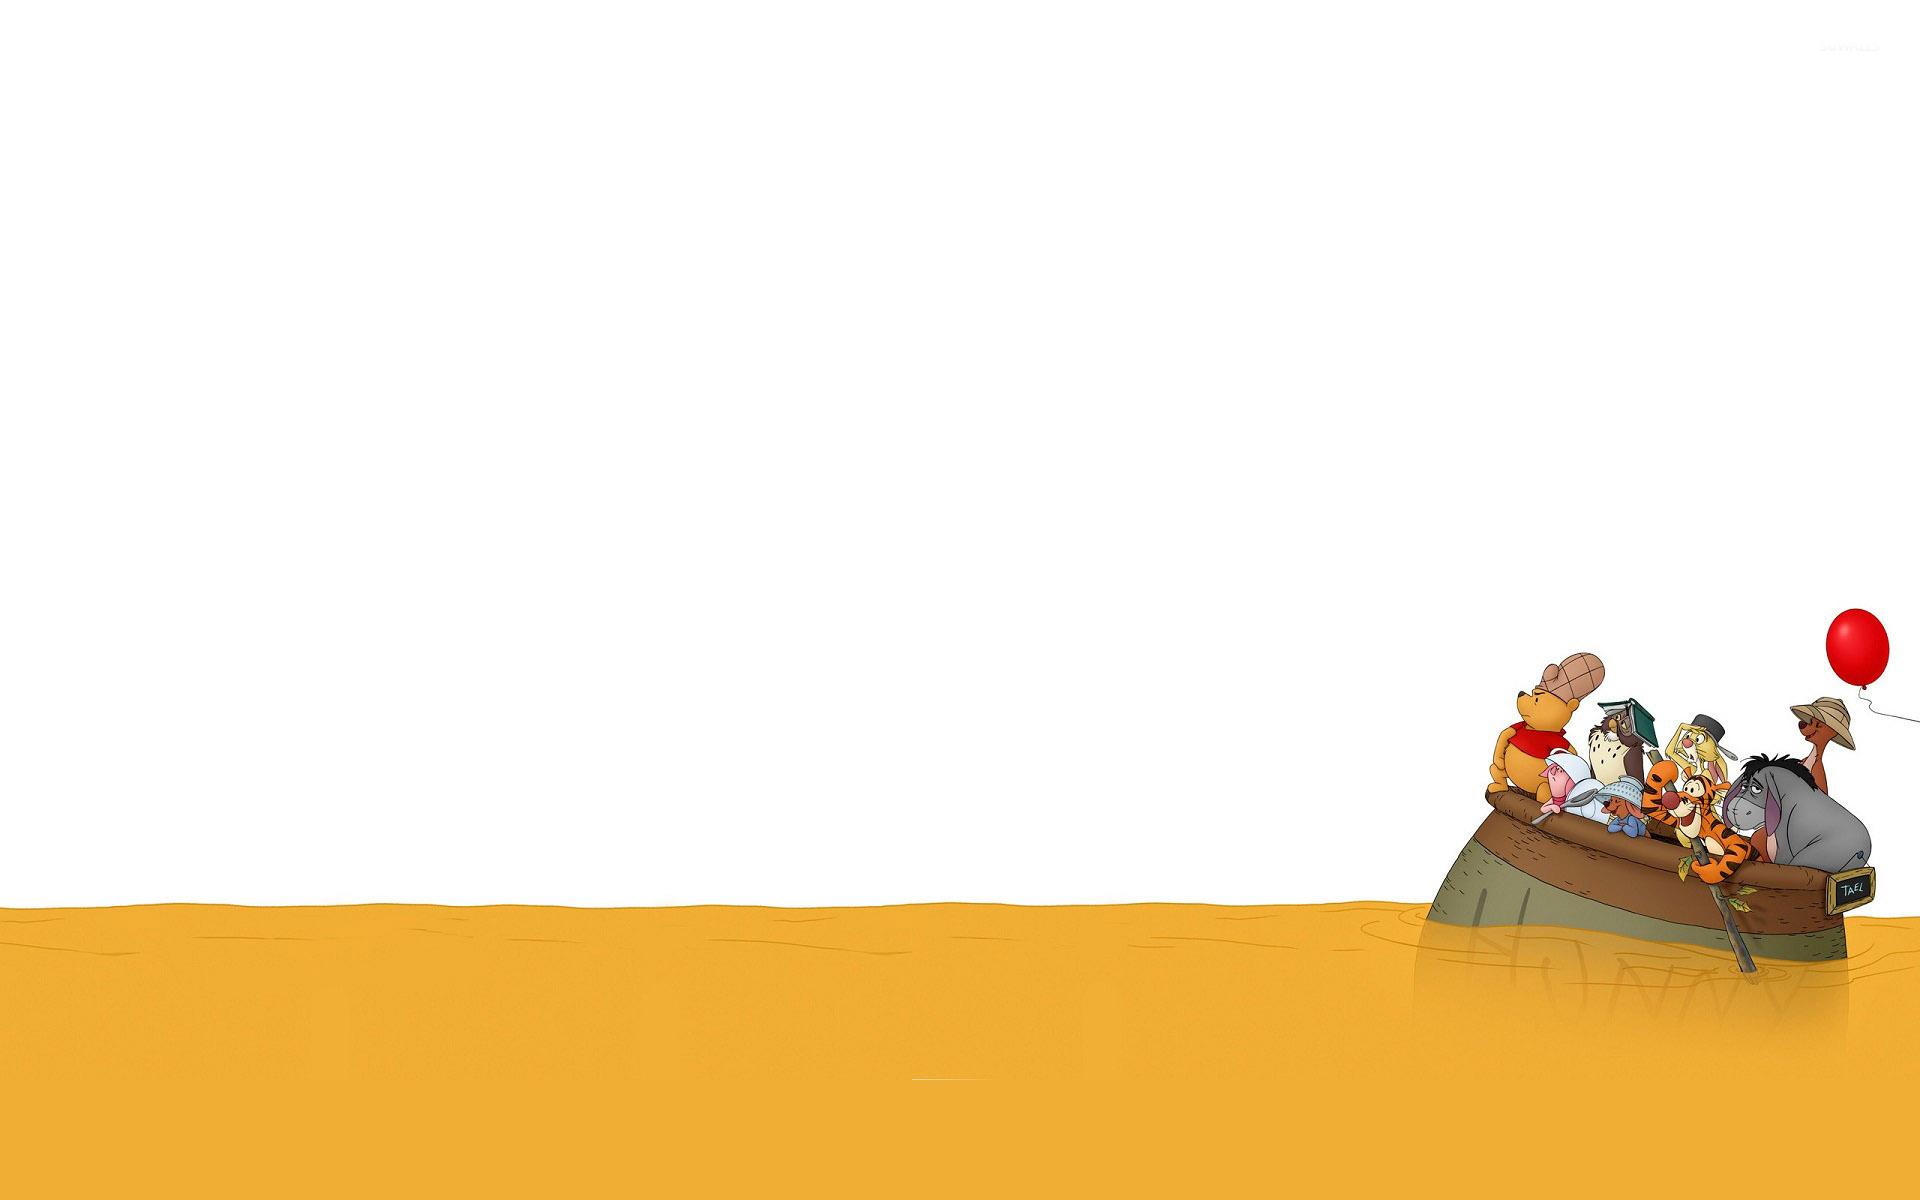 Wallpaper Gravity Falls Winnie The Pooh Wallpaper Cartoon Wallpapers 29017